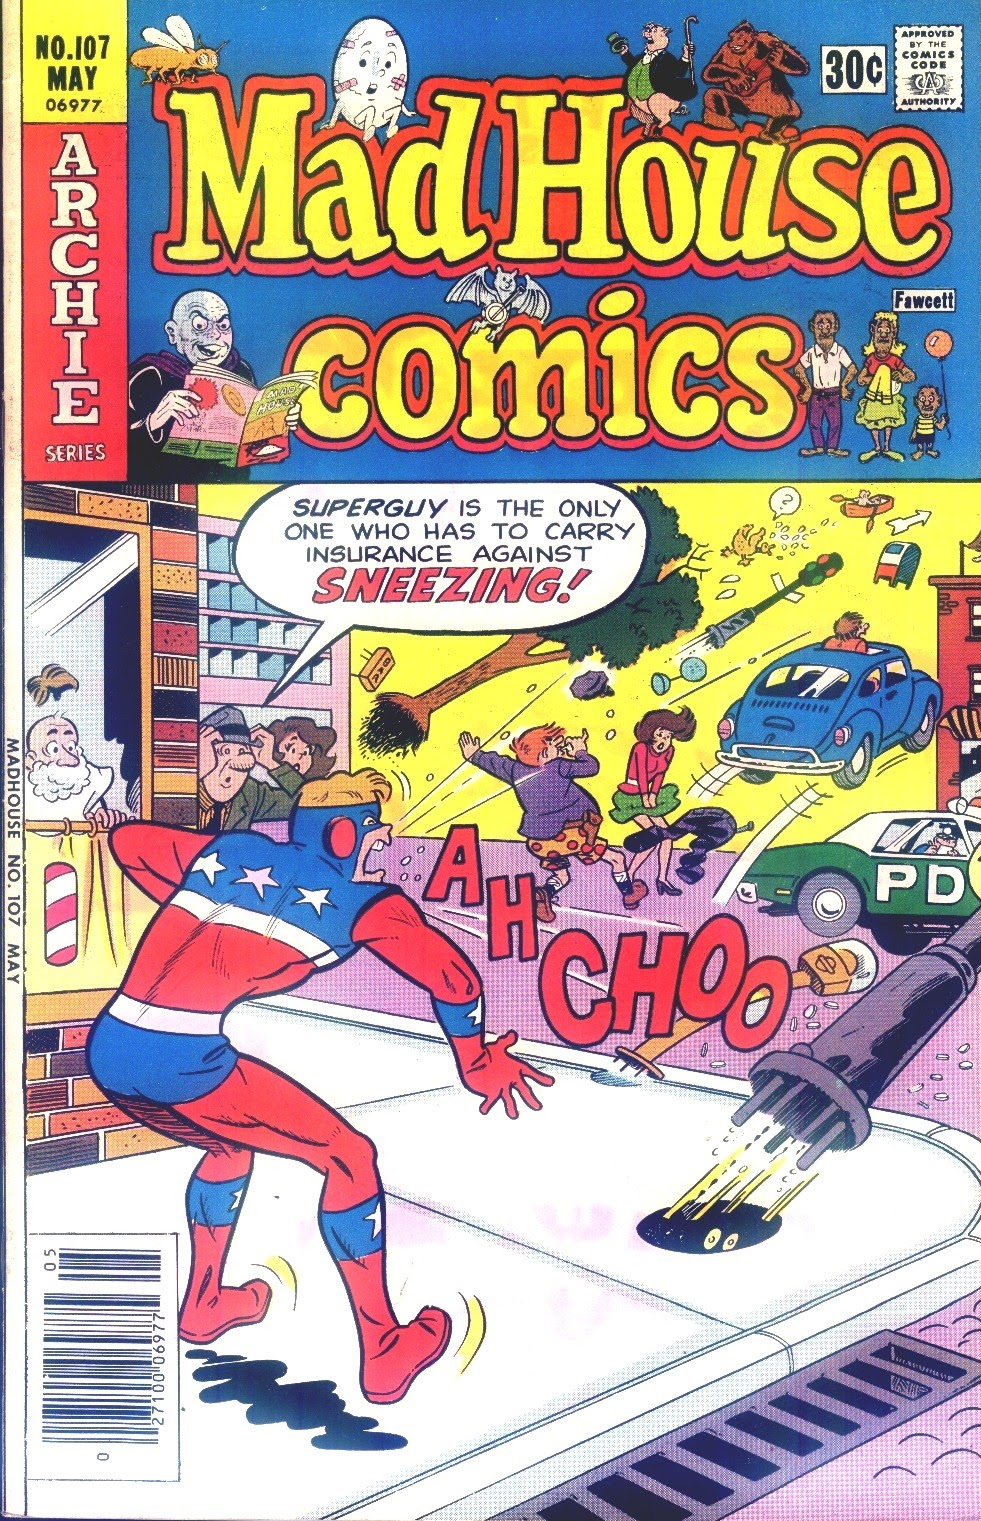 Madhouse Comics 107 Page 1